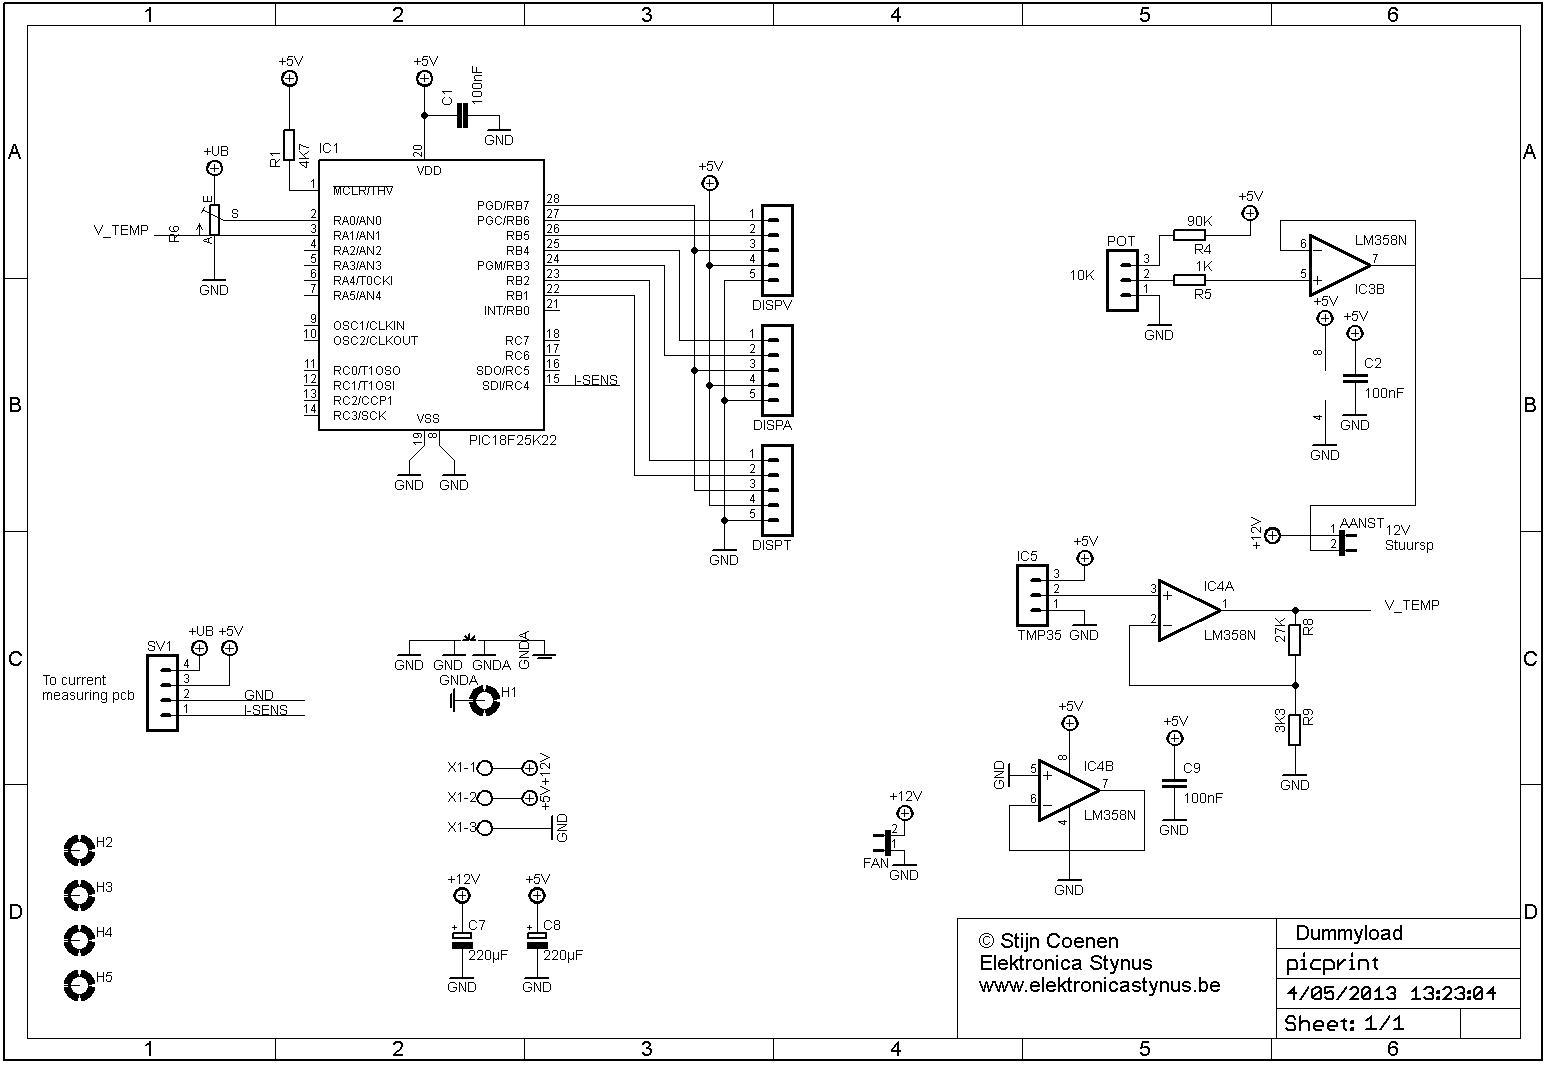 https://elektronicastynus.be/image/77/Main_schema.png